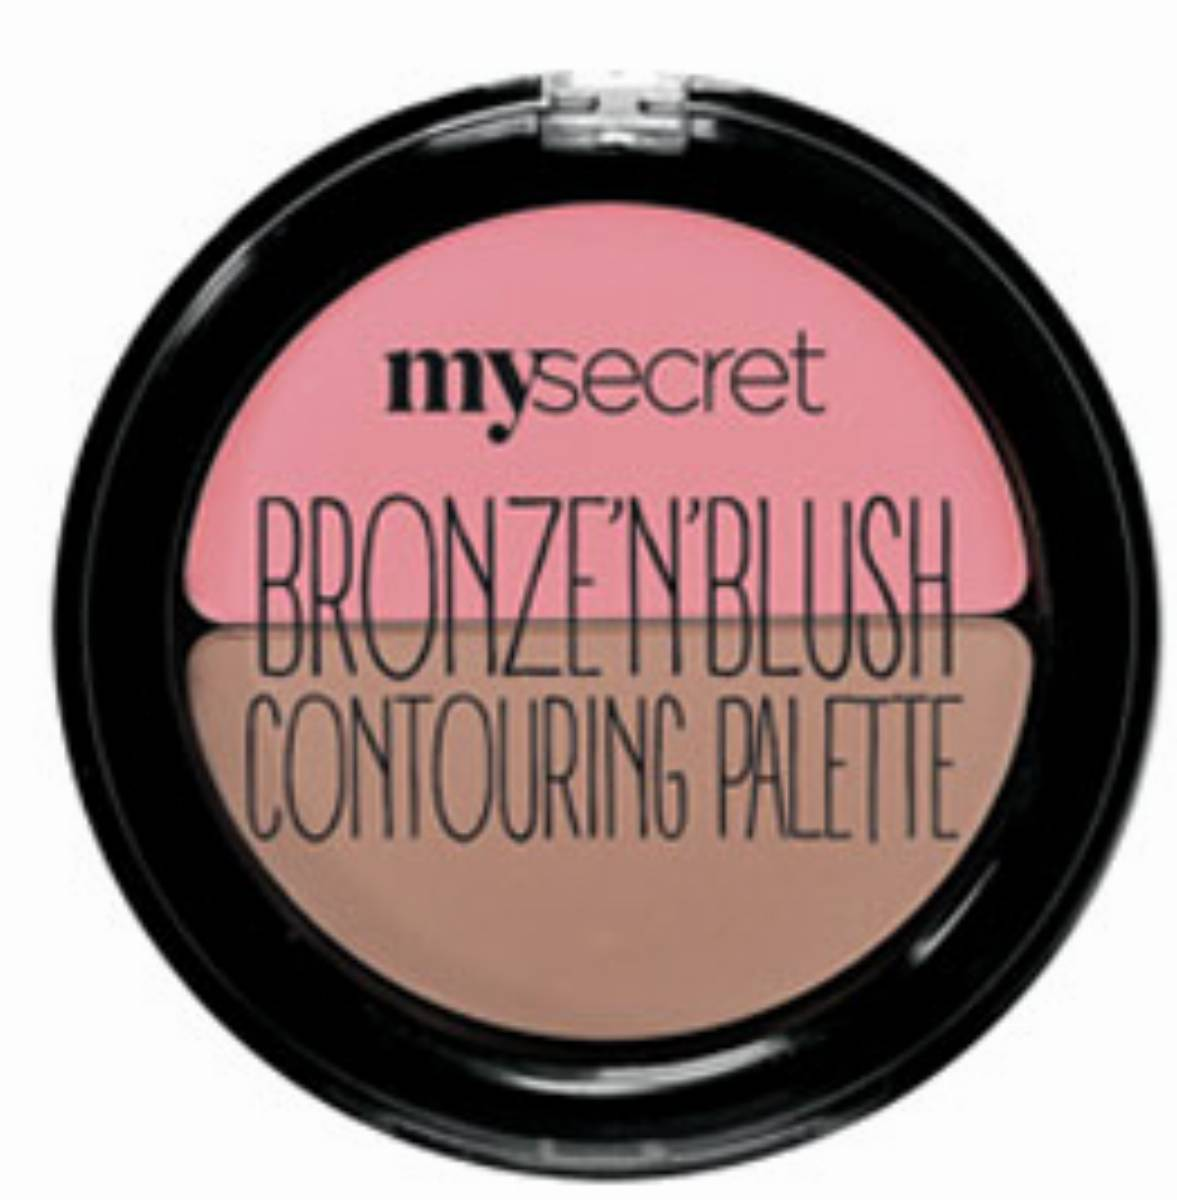 My_Secret_Bronze'N'Blush_Contouring_Palette